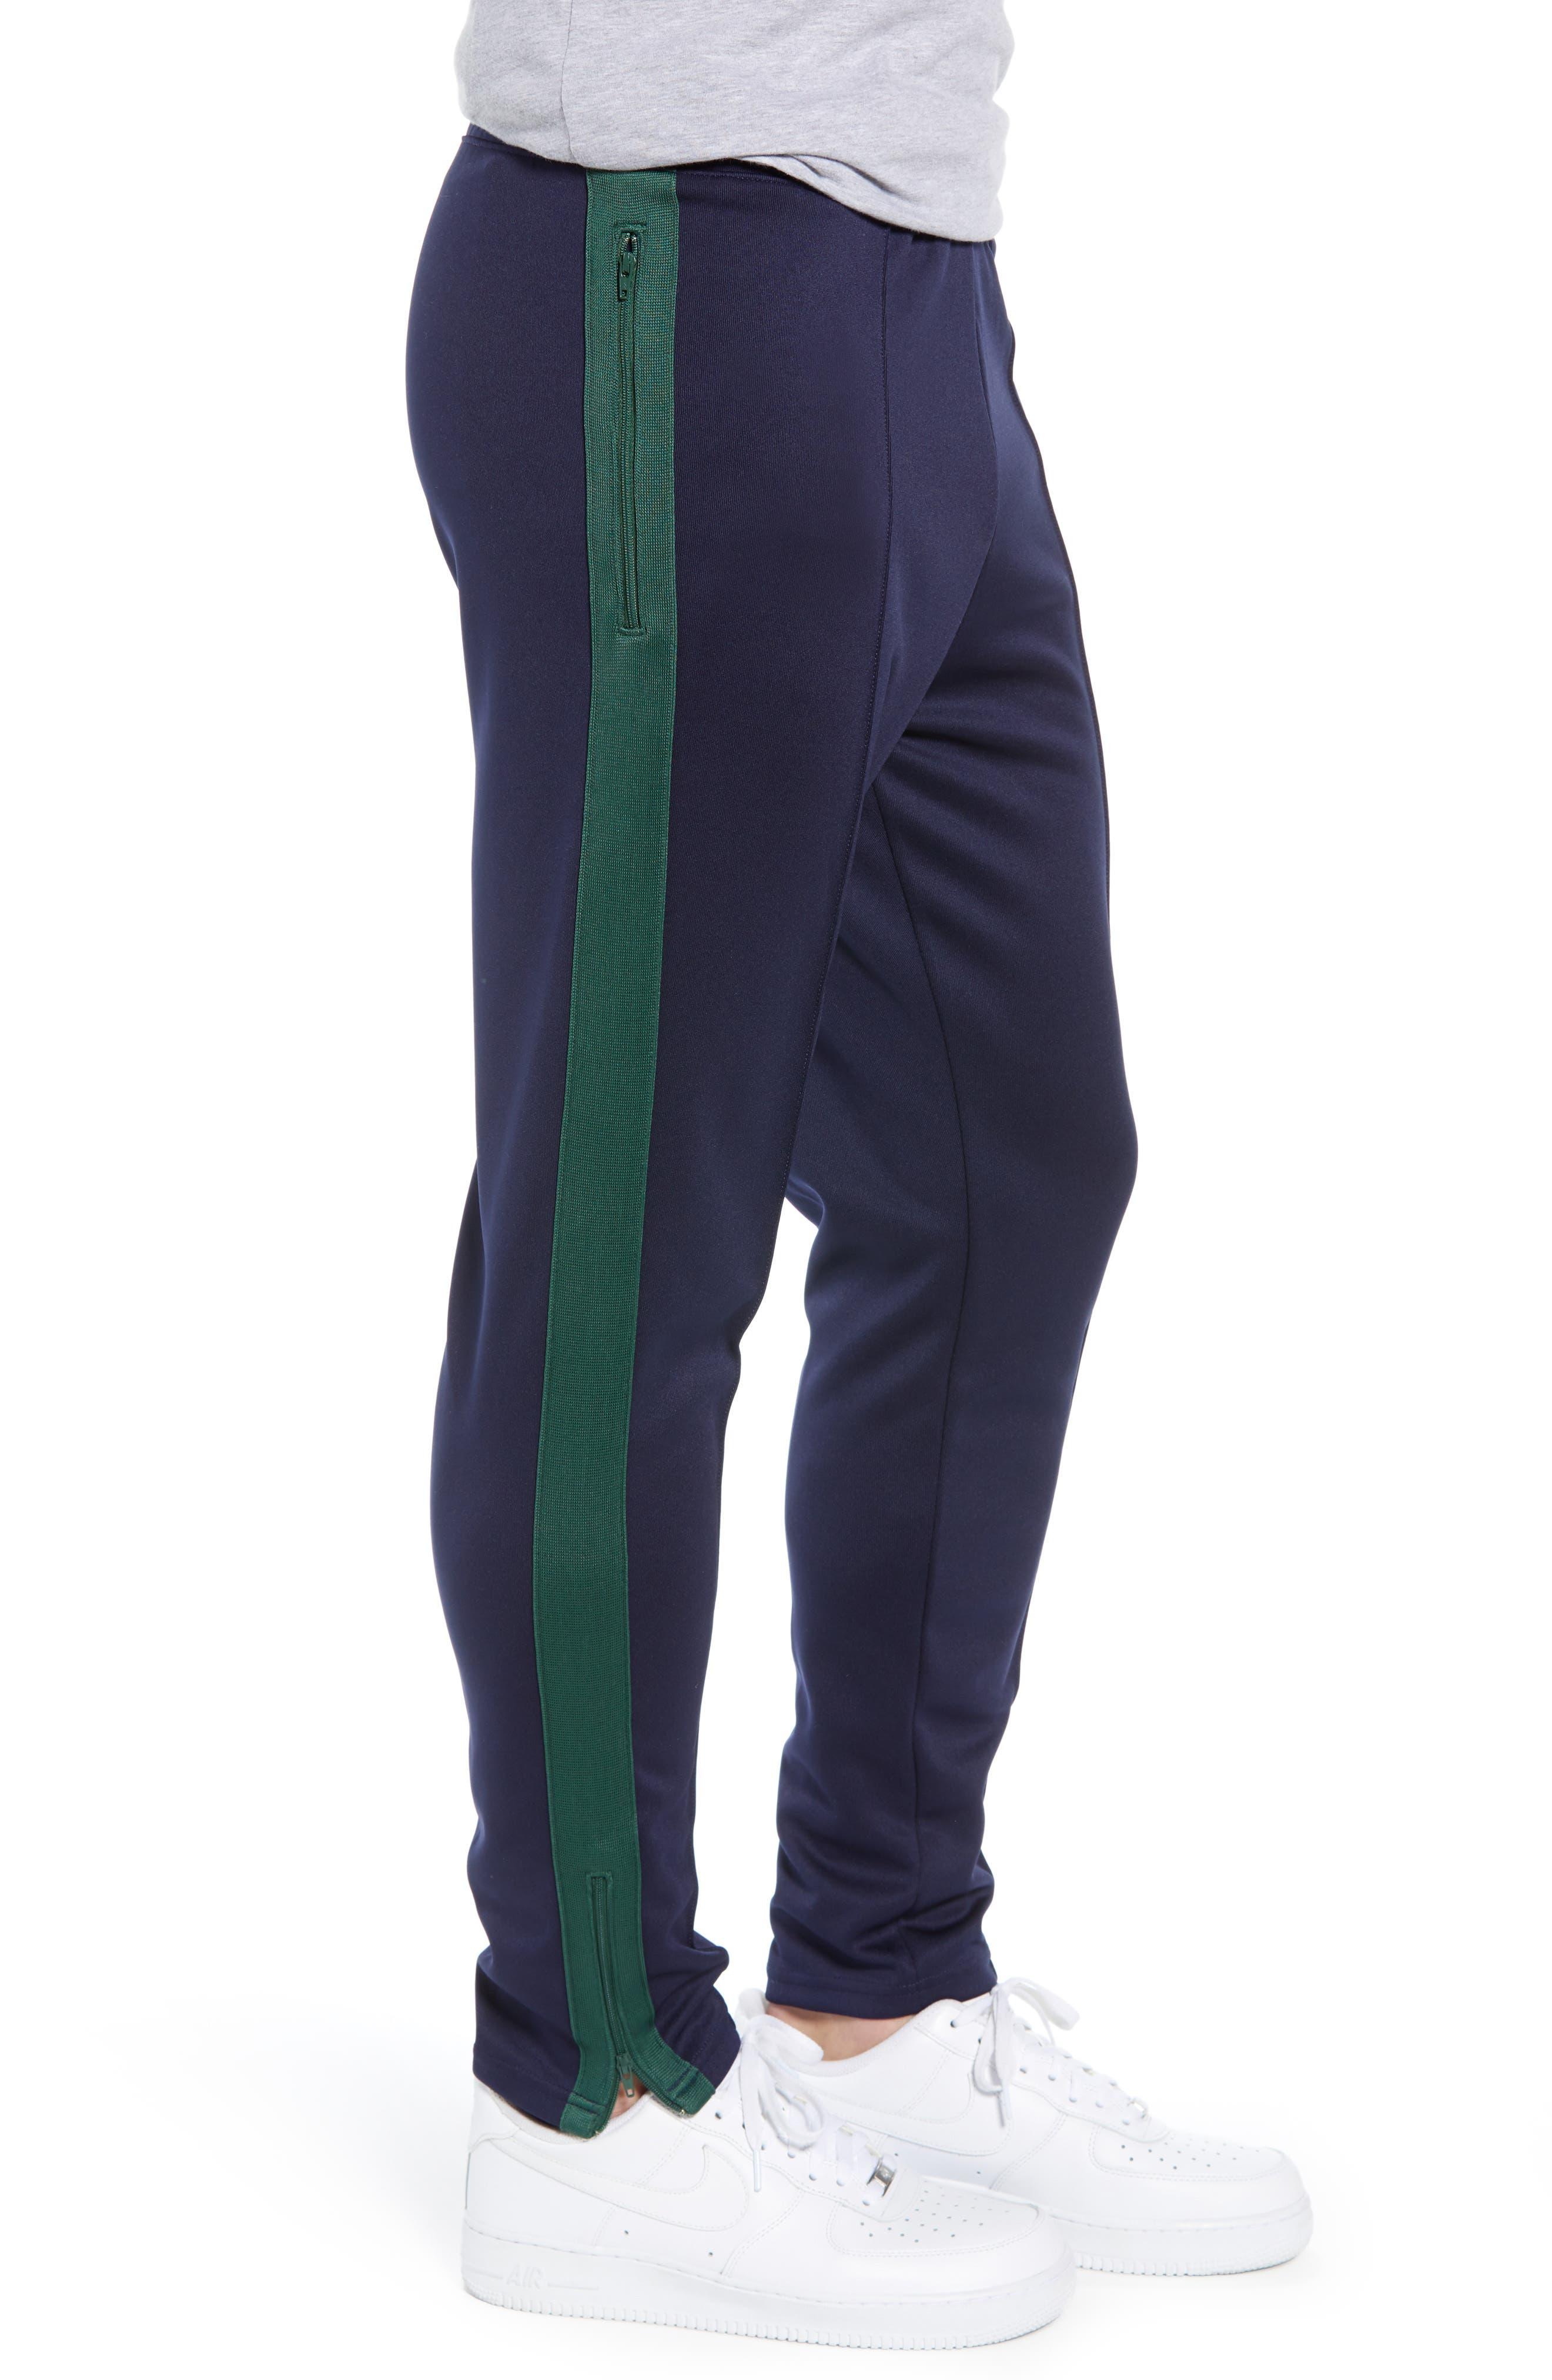 NIKE,                             x Martine Rose Men's Track Pants,                             Alternate thumbnail 3, color,                             BLACKENED BLUE/ FIR